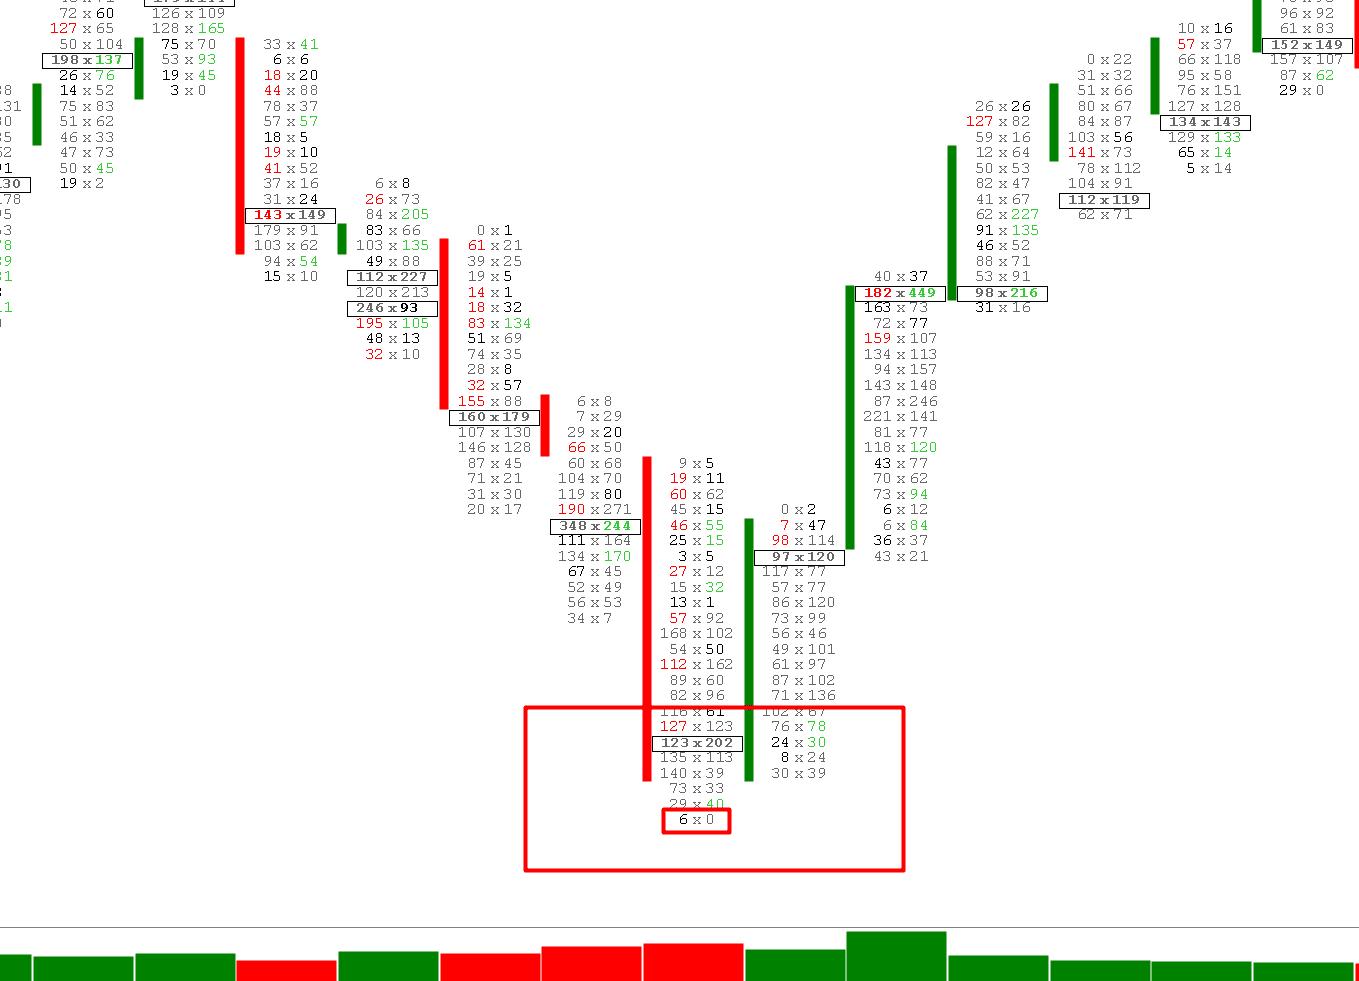 footprint chart explanation